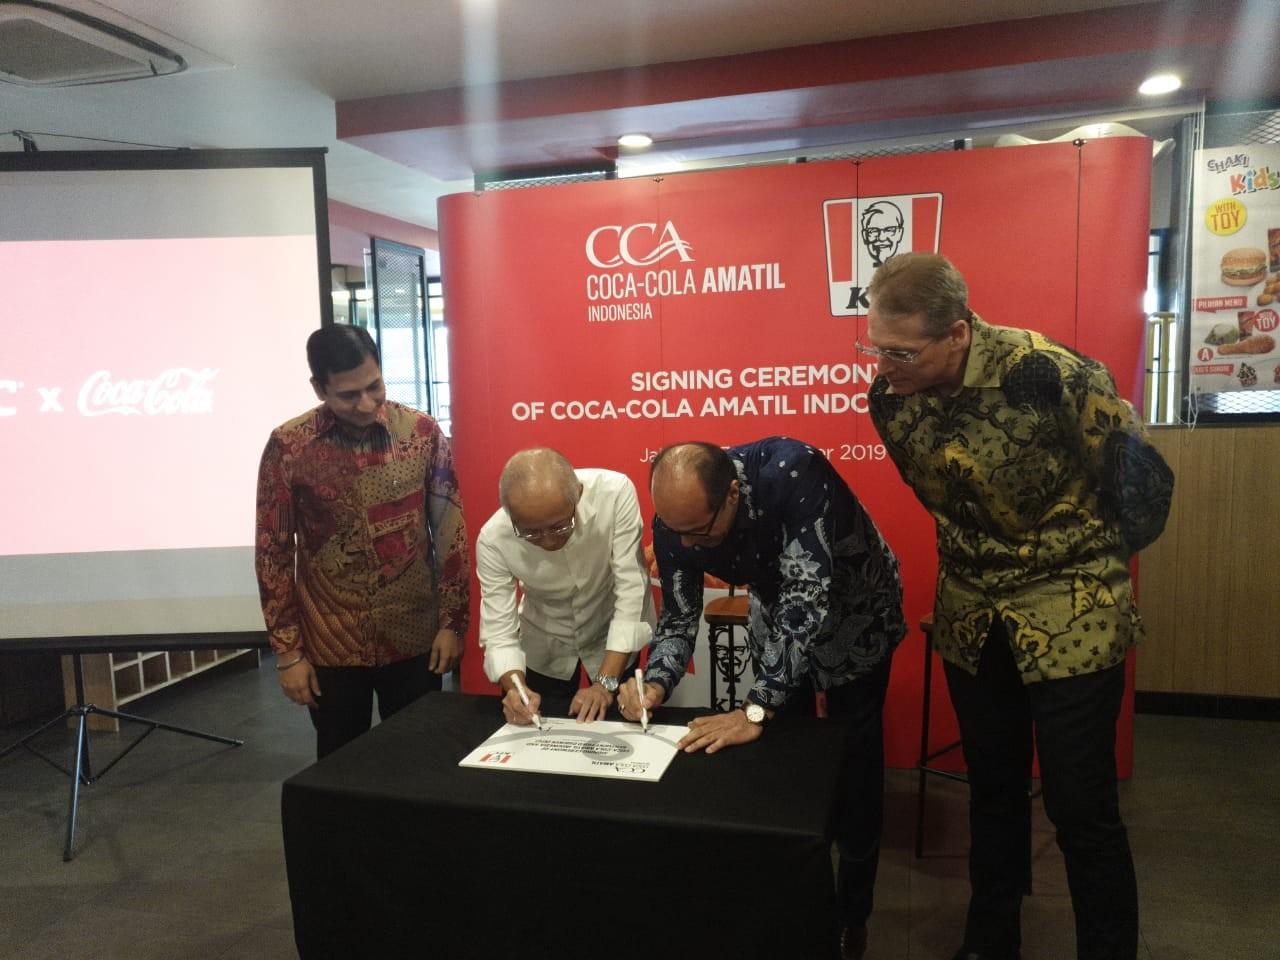 Bright future for Coca-Cola as it replaces Pepsi in KFC Indonesia restaurants